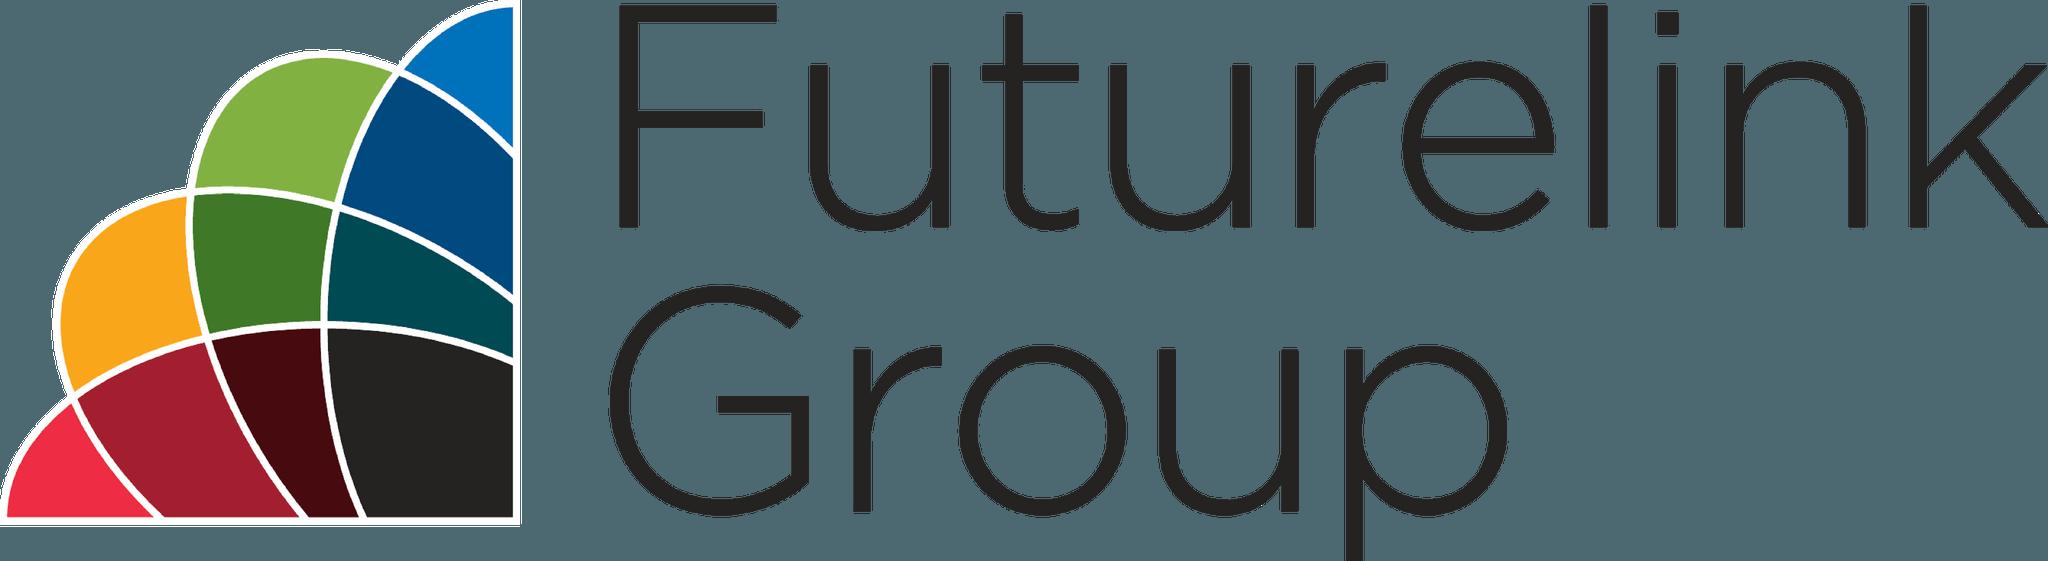 Futurelink Group